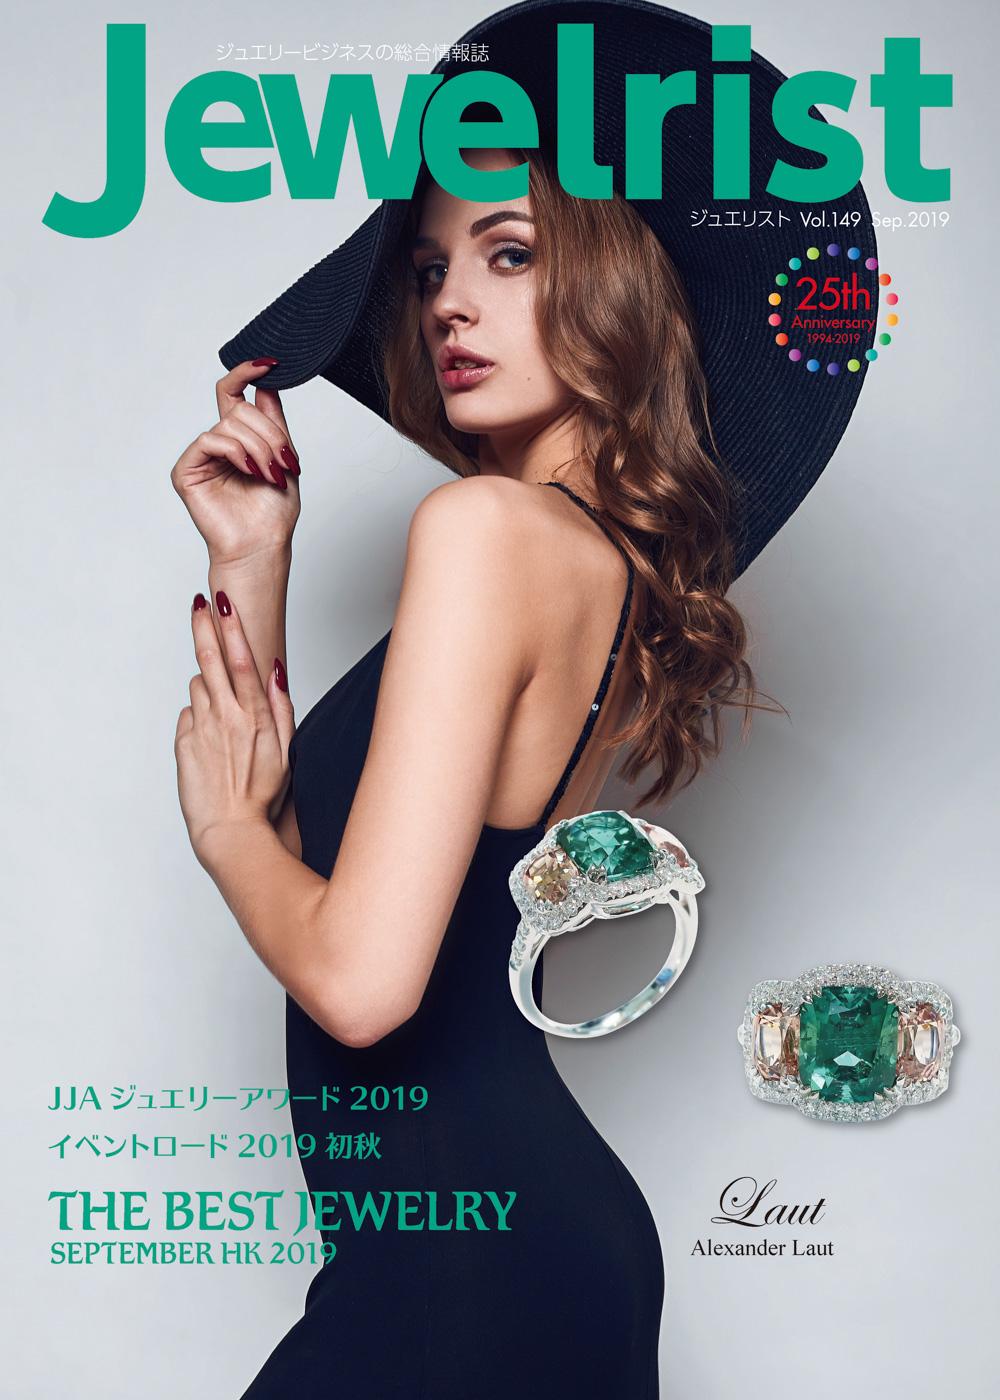 jewelrist ジュエリストvol.149